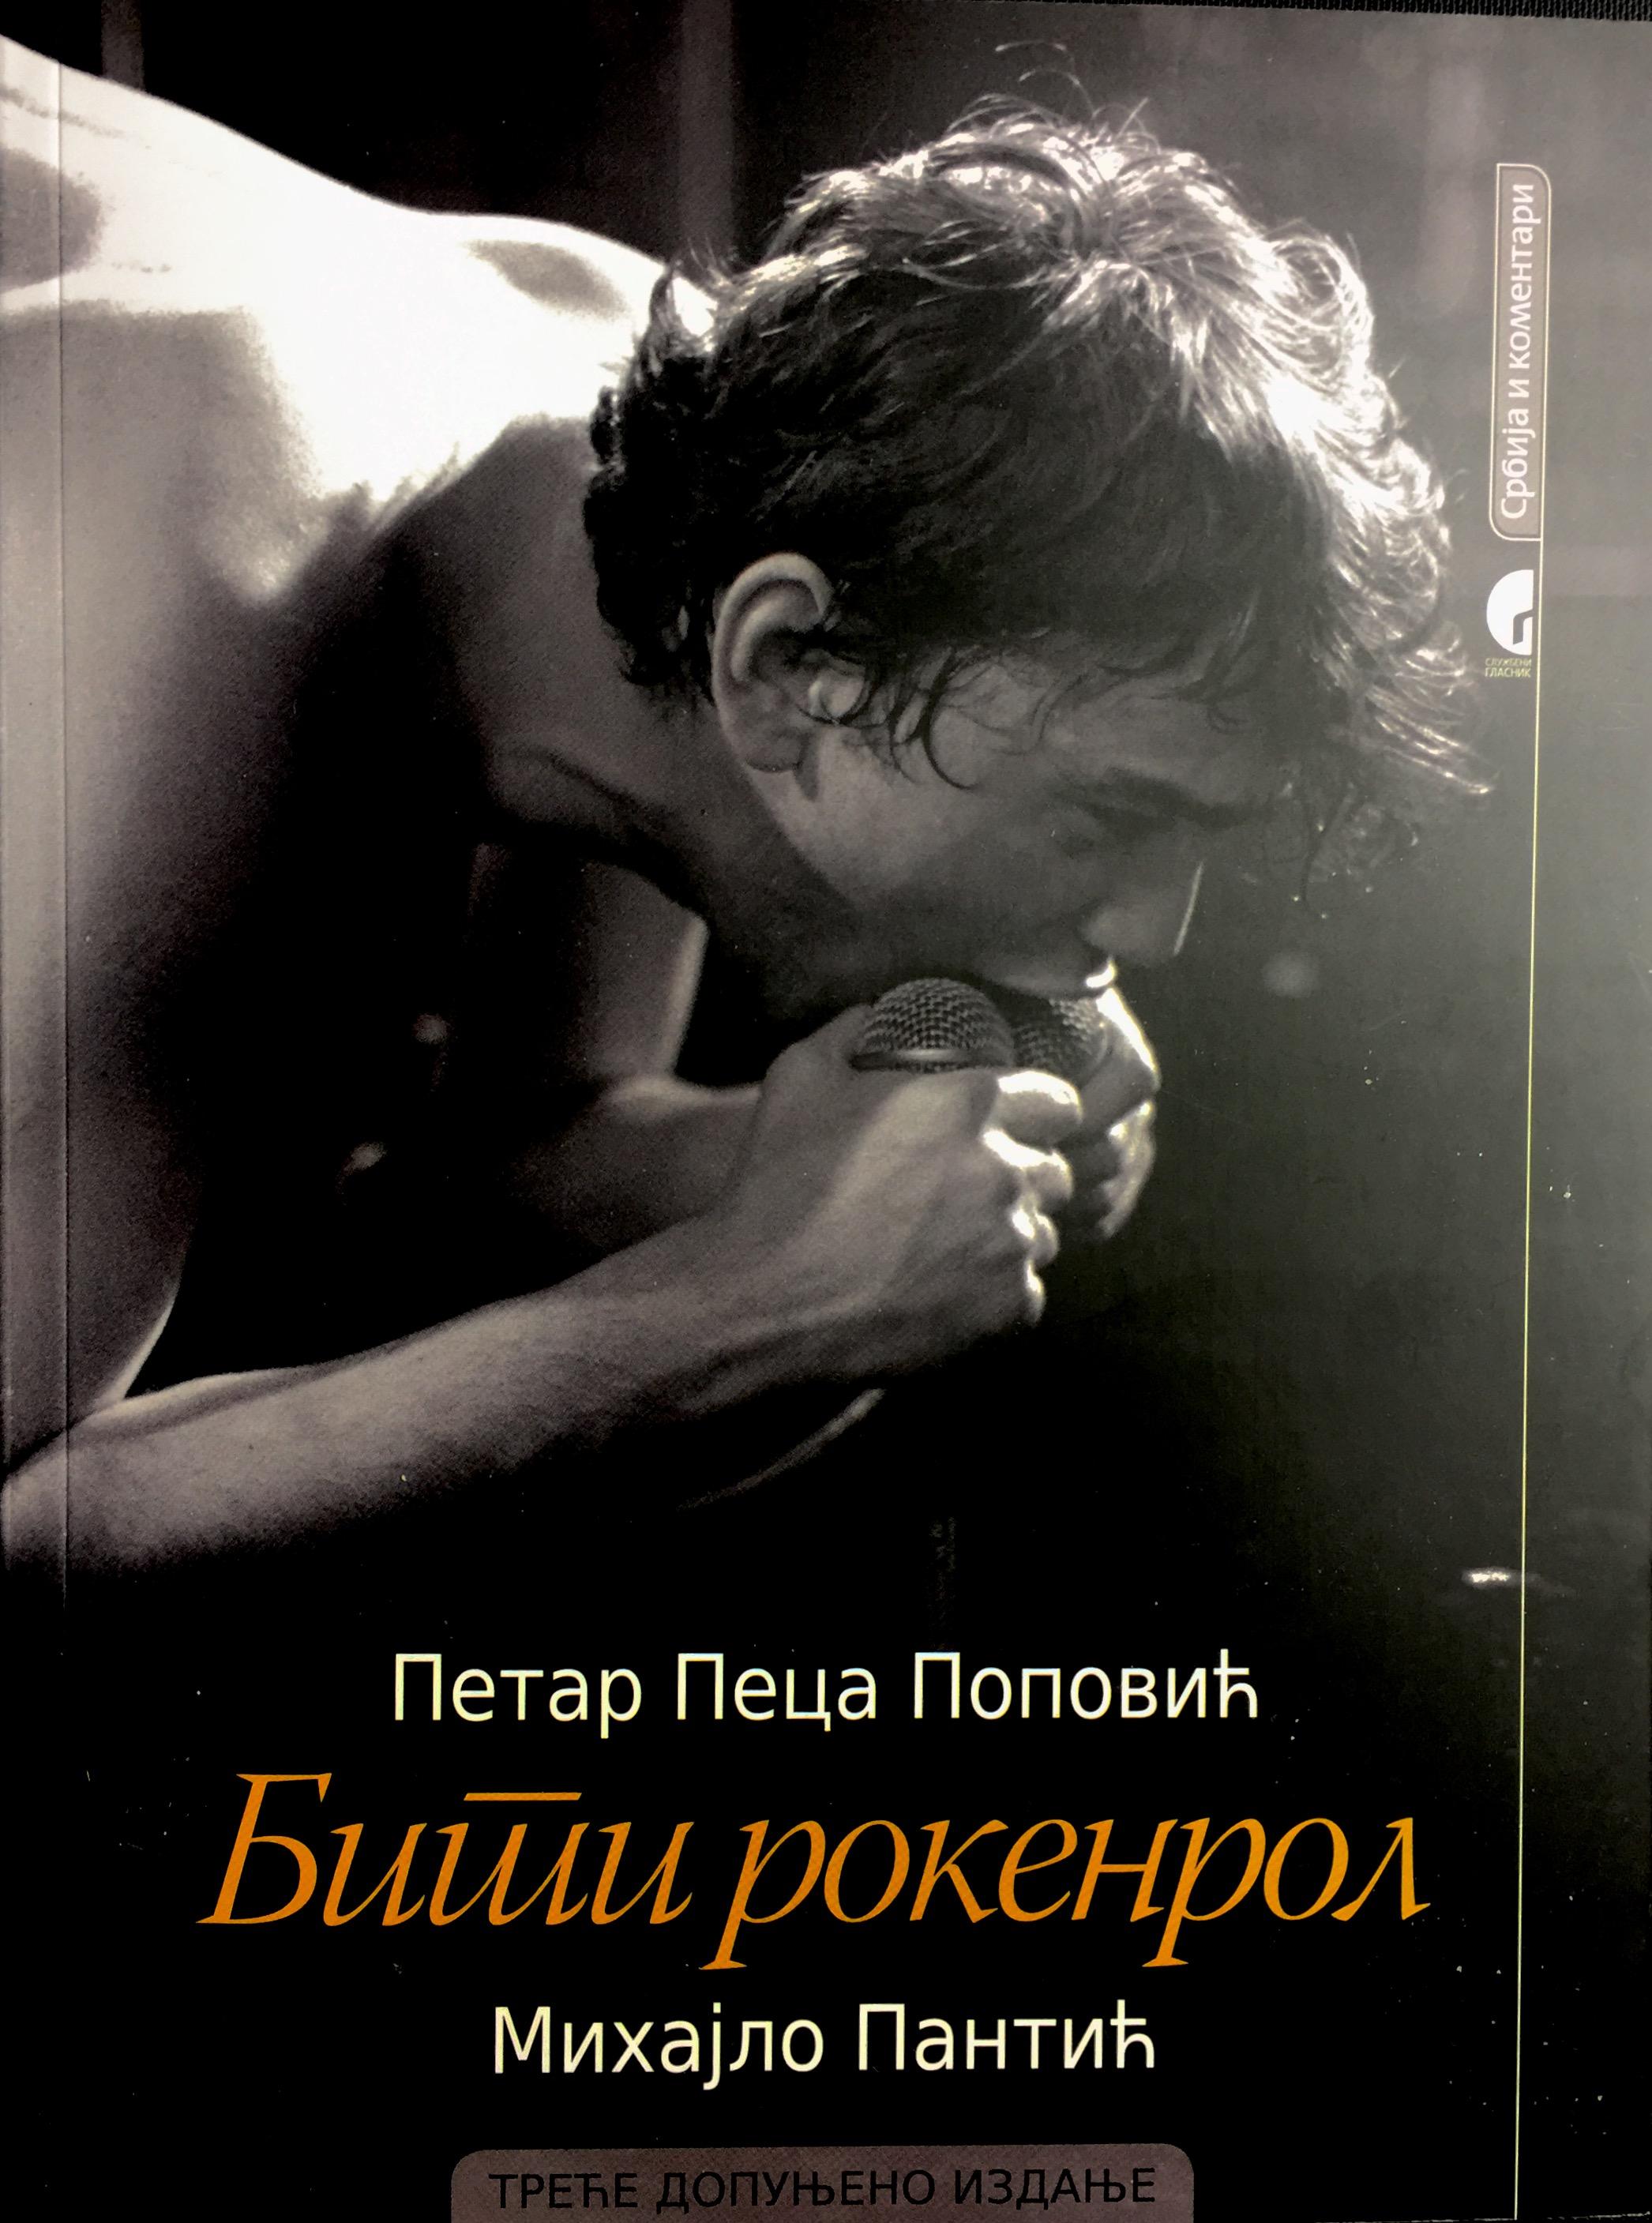 KNJIGA sa AUTOGRAMOM Pece Popovica, cirilica,163 str. ($50)